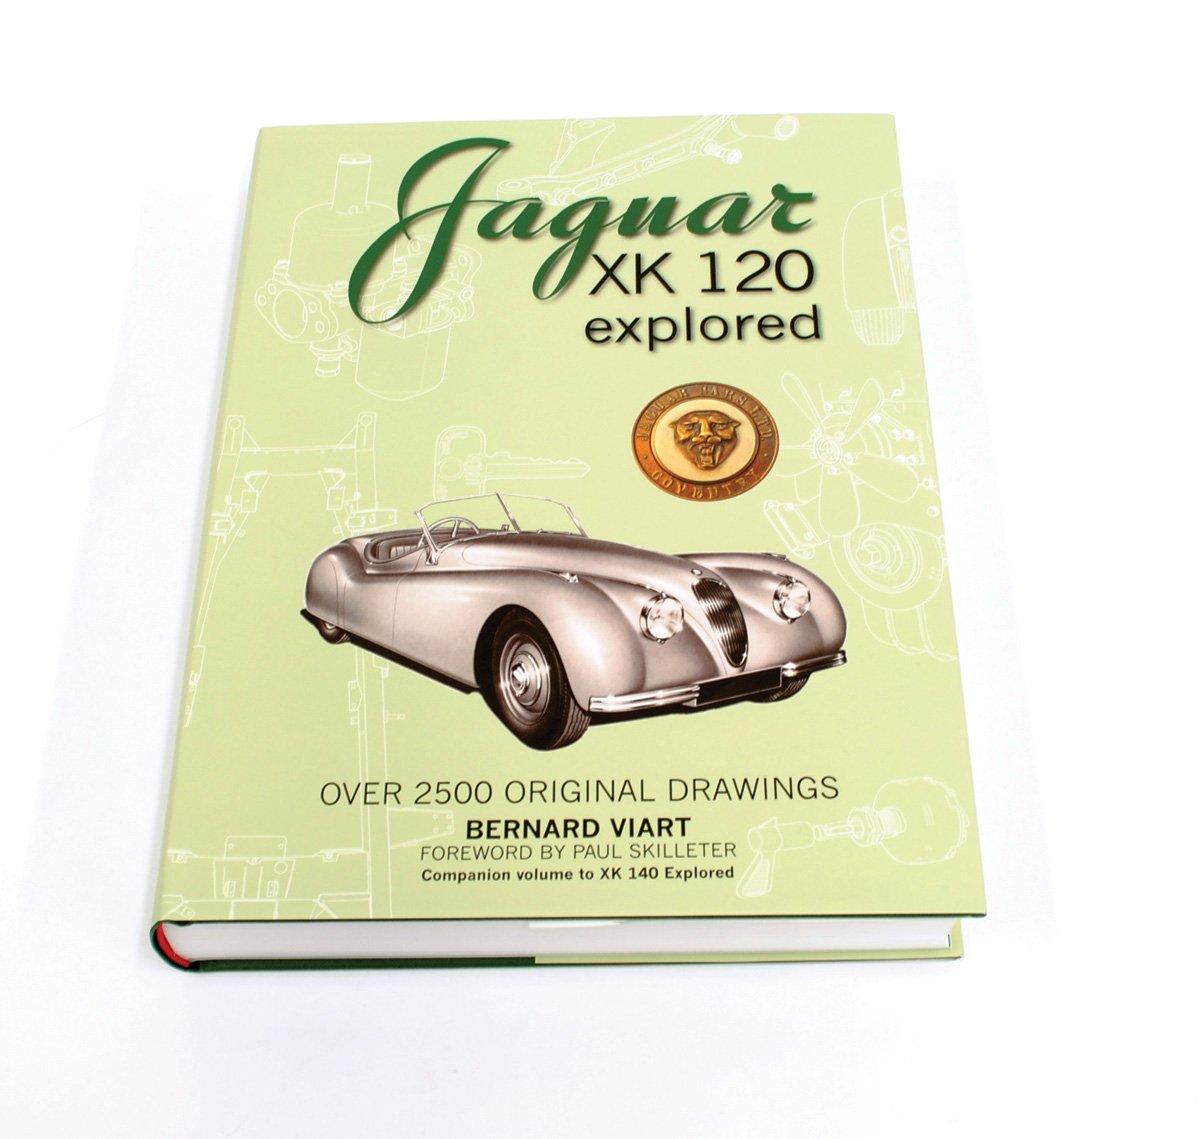 Jaguar Xk 120 Explored Inc 2500 Original Drawings Mark X Wiring Diagram Bernard Viart 9781908658005 Books